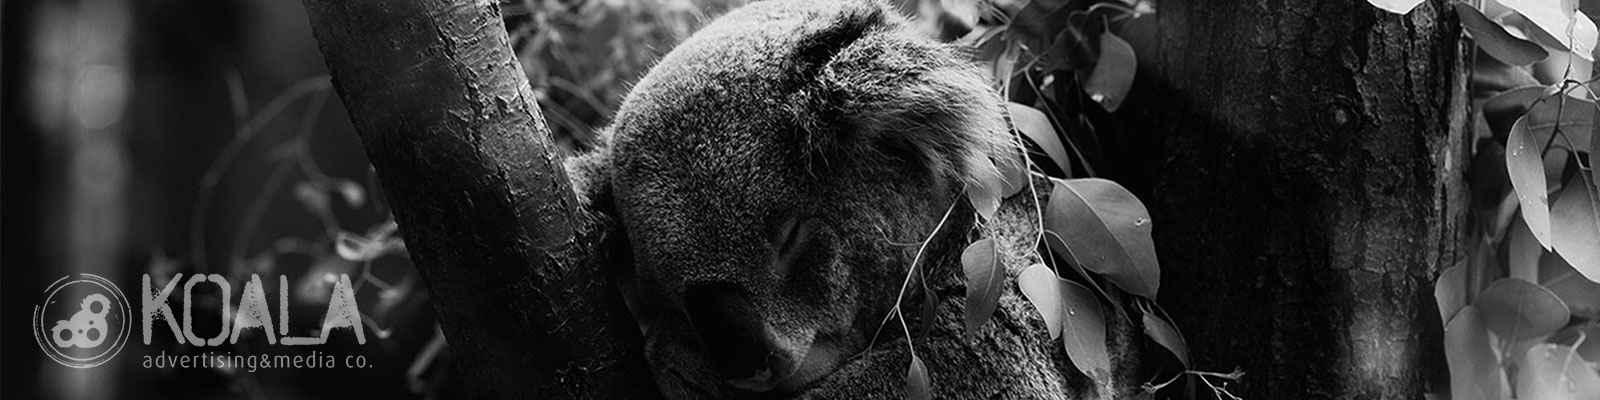 Koala Project banner fotograf